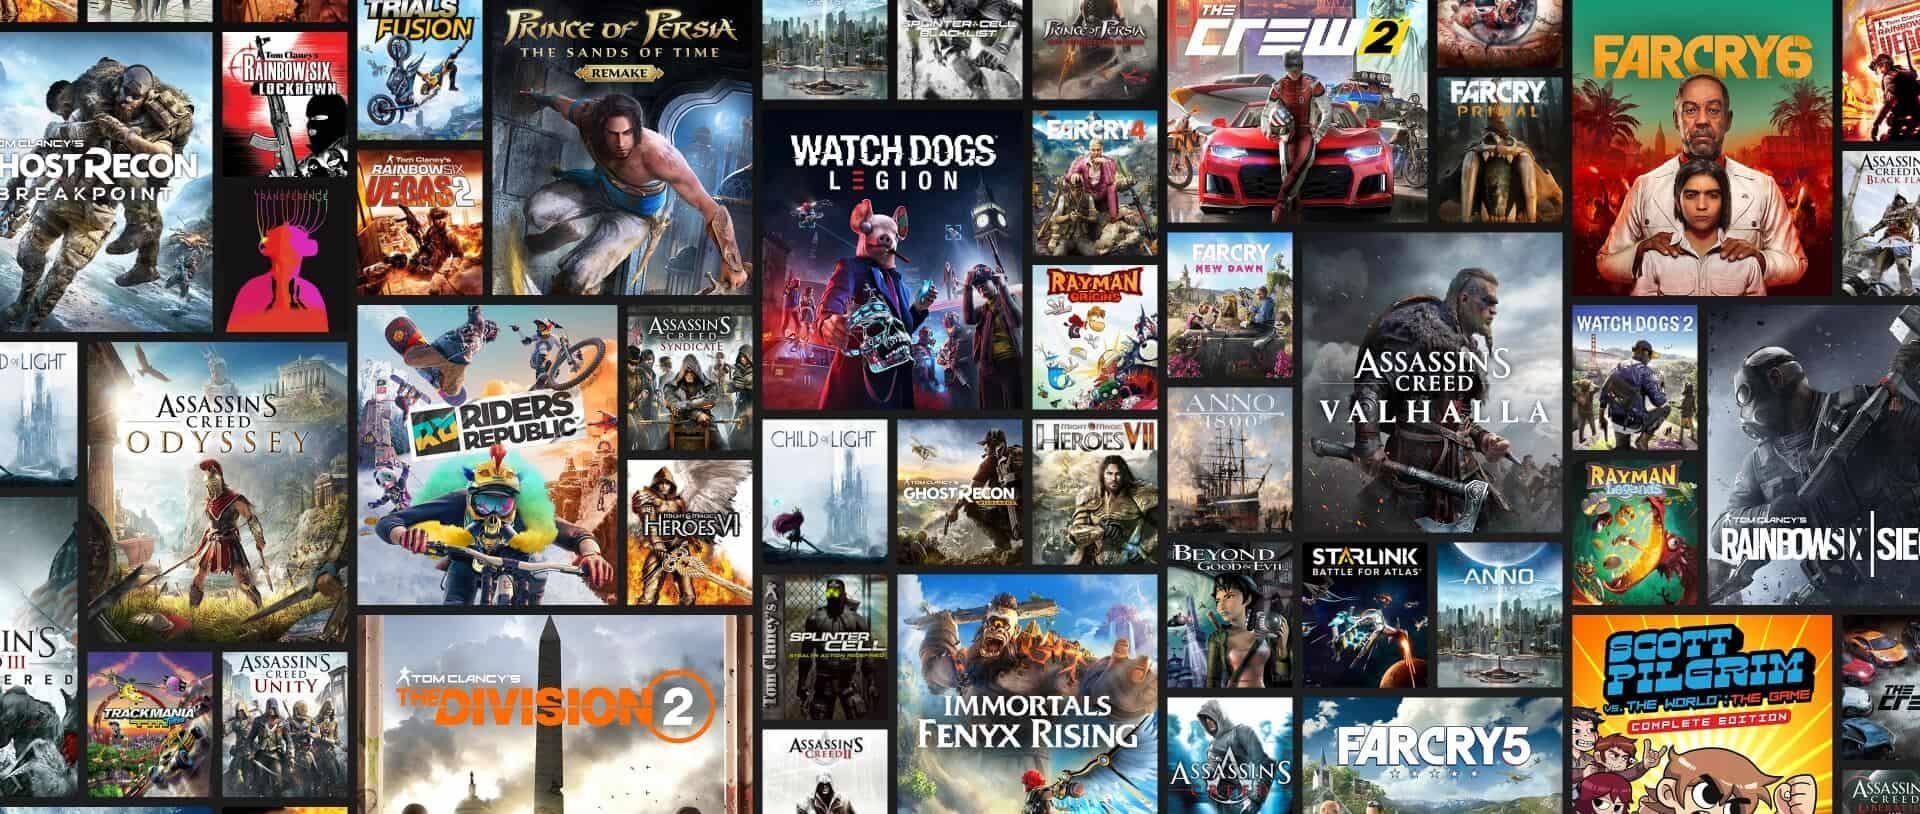 Ubisoft+ podría unirse a Xbox Game Pass según Jeff Grubb 2